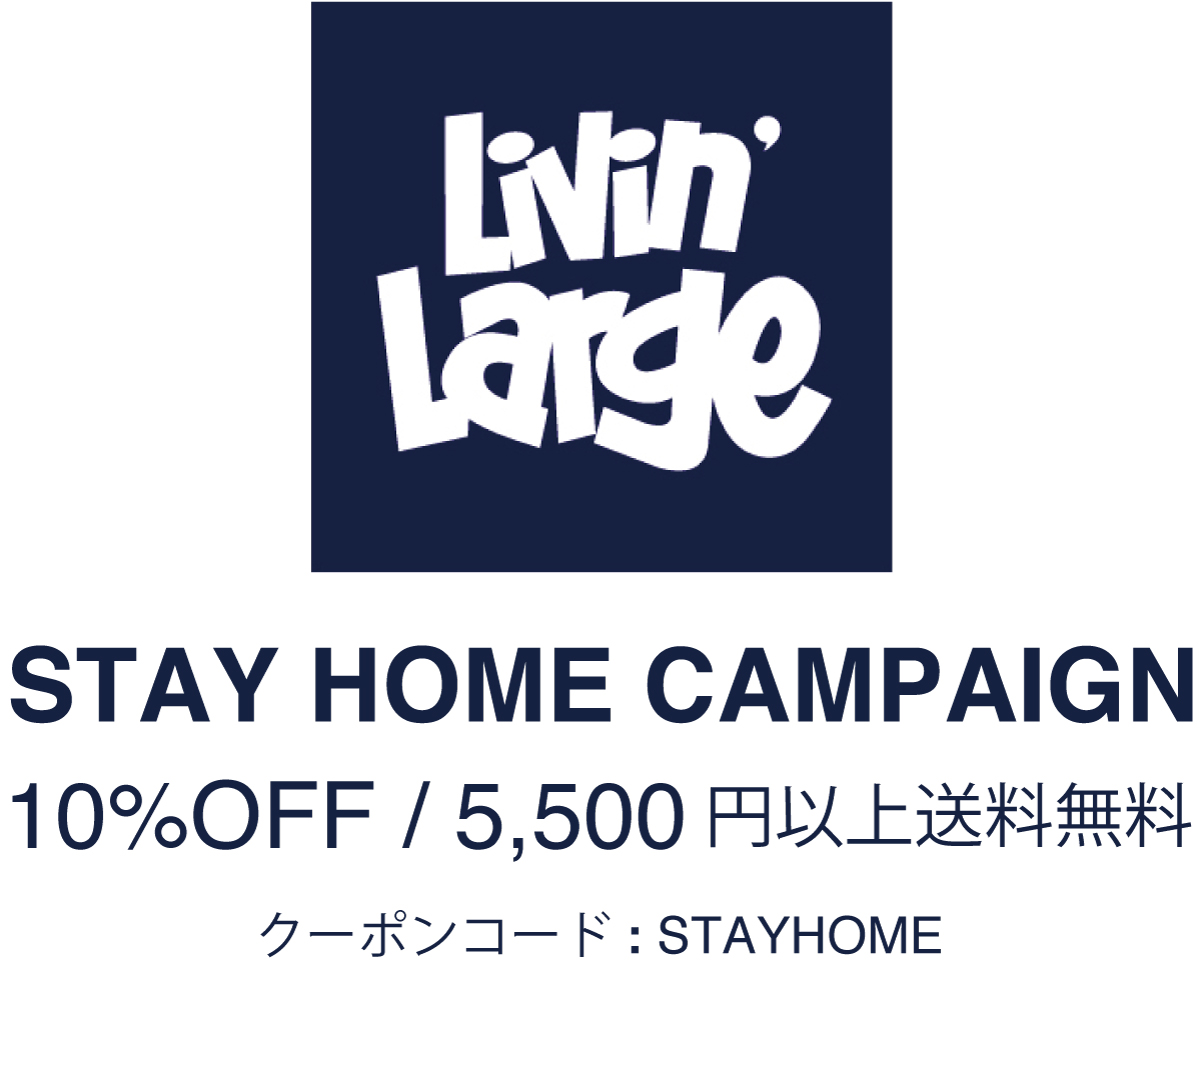 STAY HOMEキャンペーン期間延長致します! 期間は、5/31(日) 23:59 迄です。